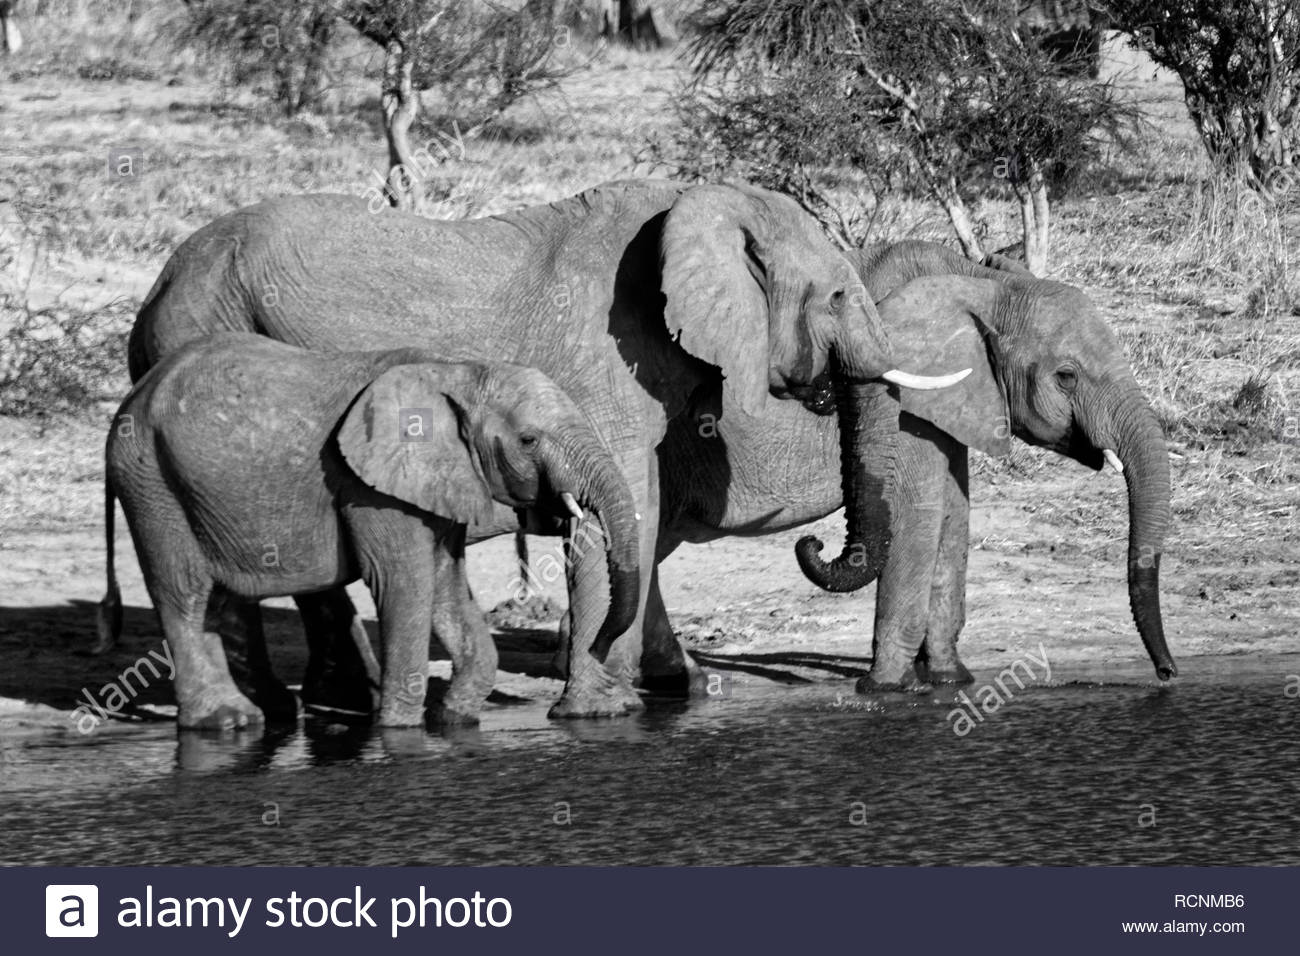 Drinking elephants in Botswana - Stock Image